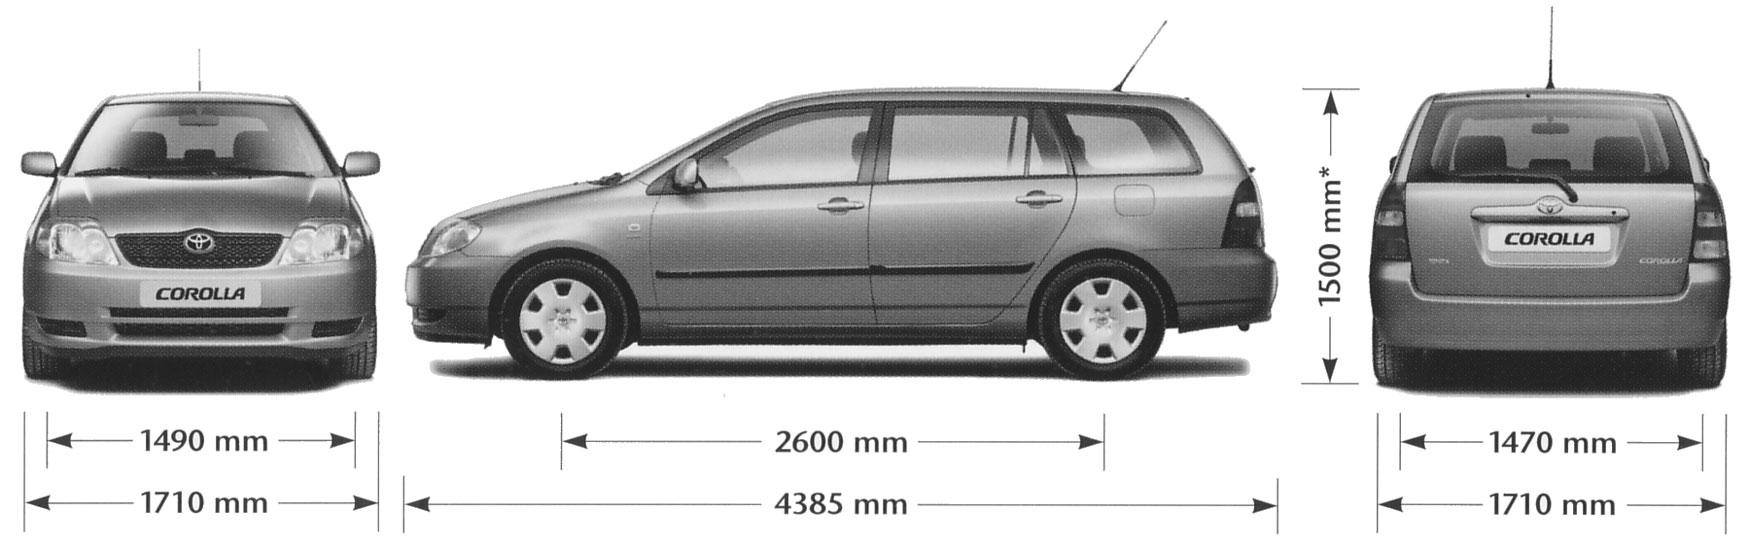 Auto Toyota Corolla Wagon Bild Bild Zeigt Abbildung